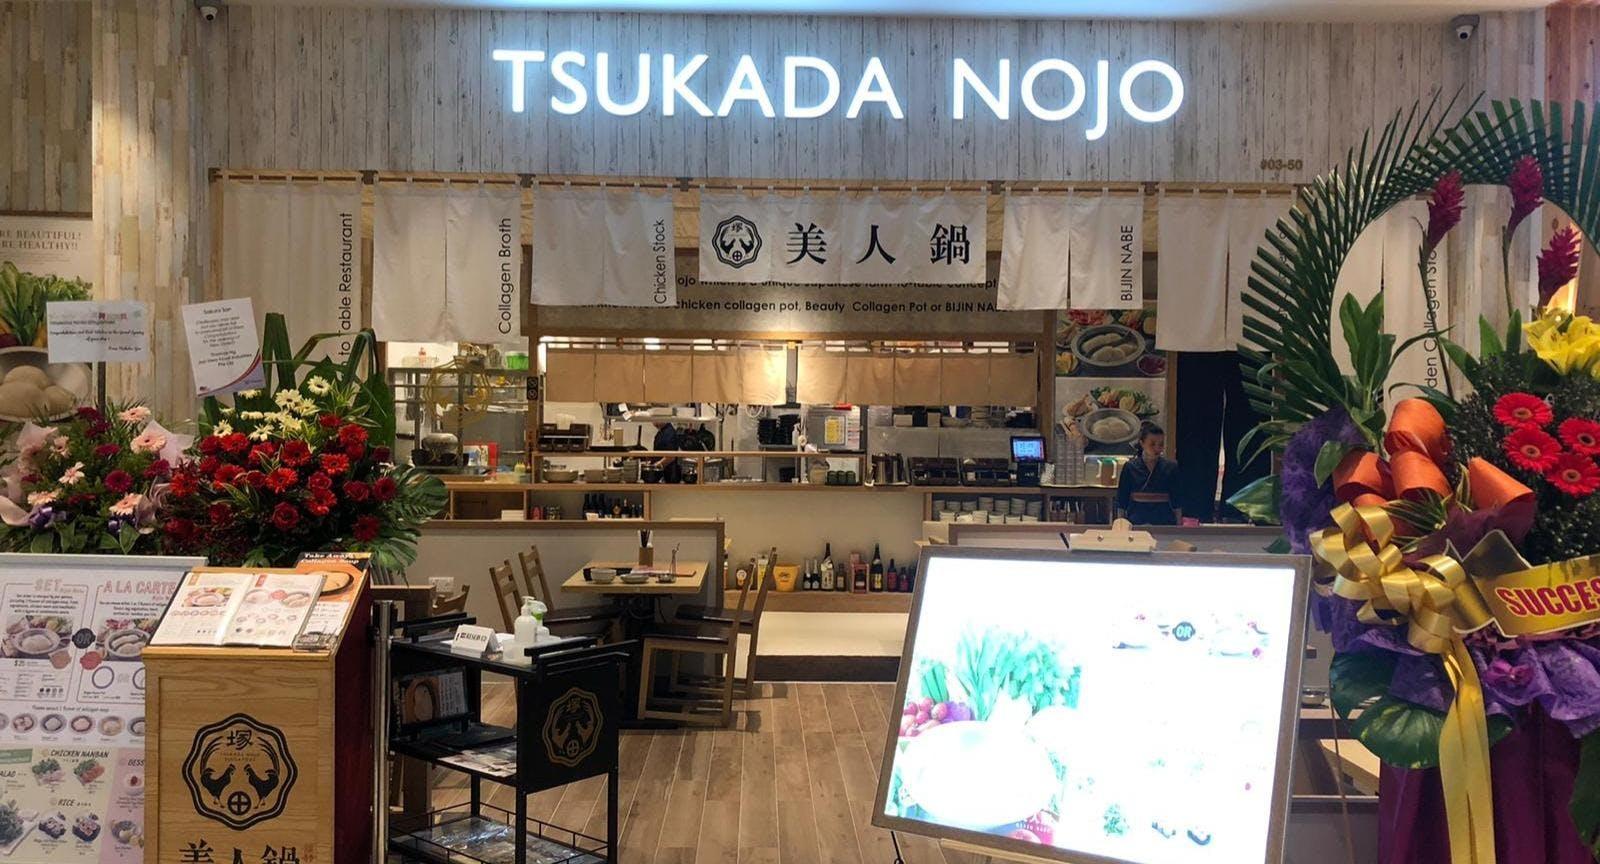 Tsukada Nojo - Thomson Plaza